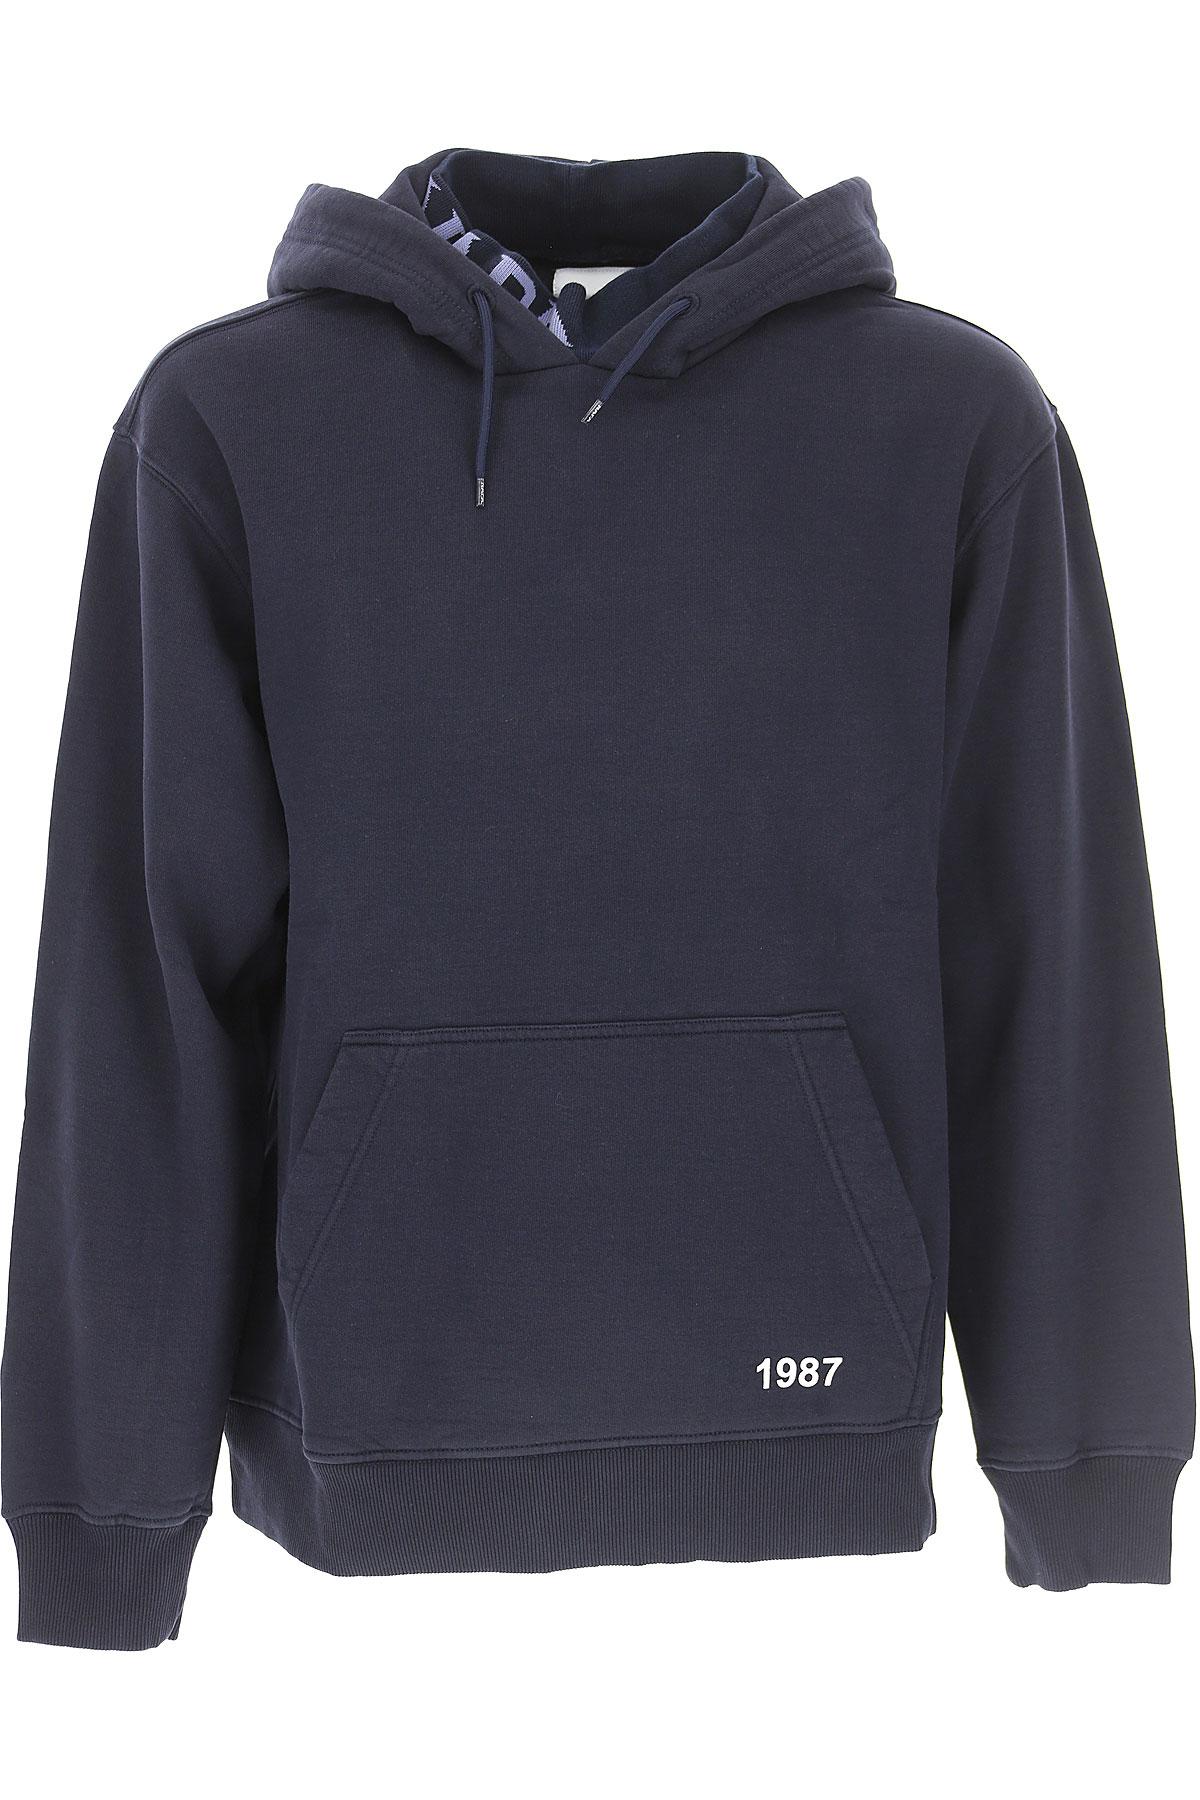 Image of Napapijri Sweatshirt for Men, Dark Blue, Cotton, 2017, L M S XL